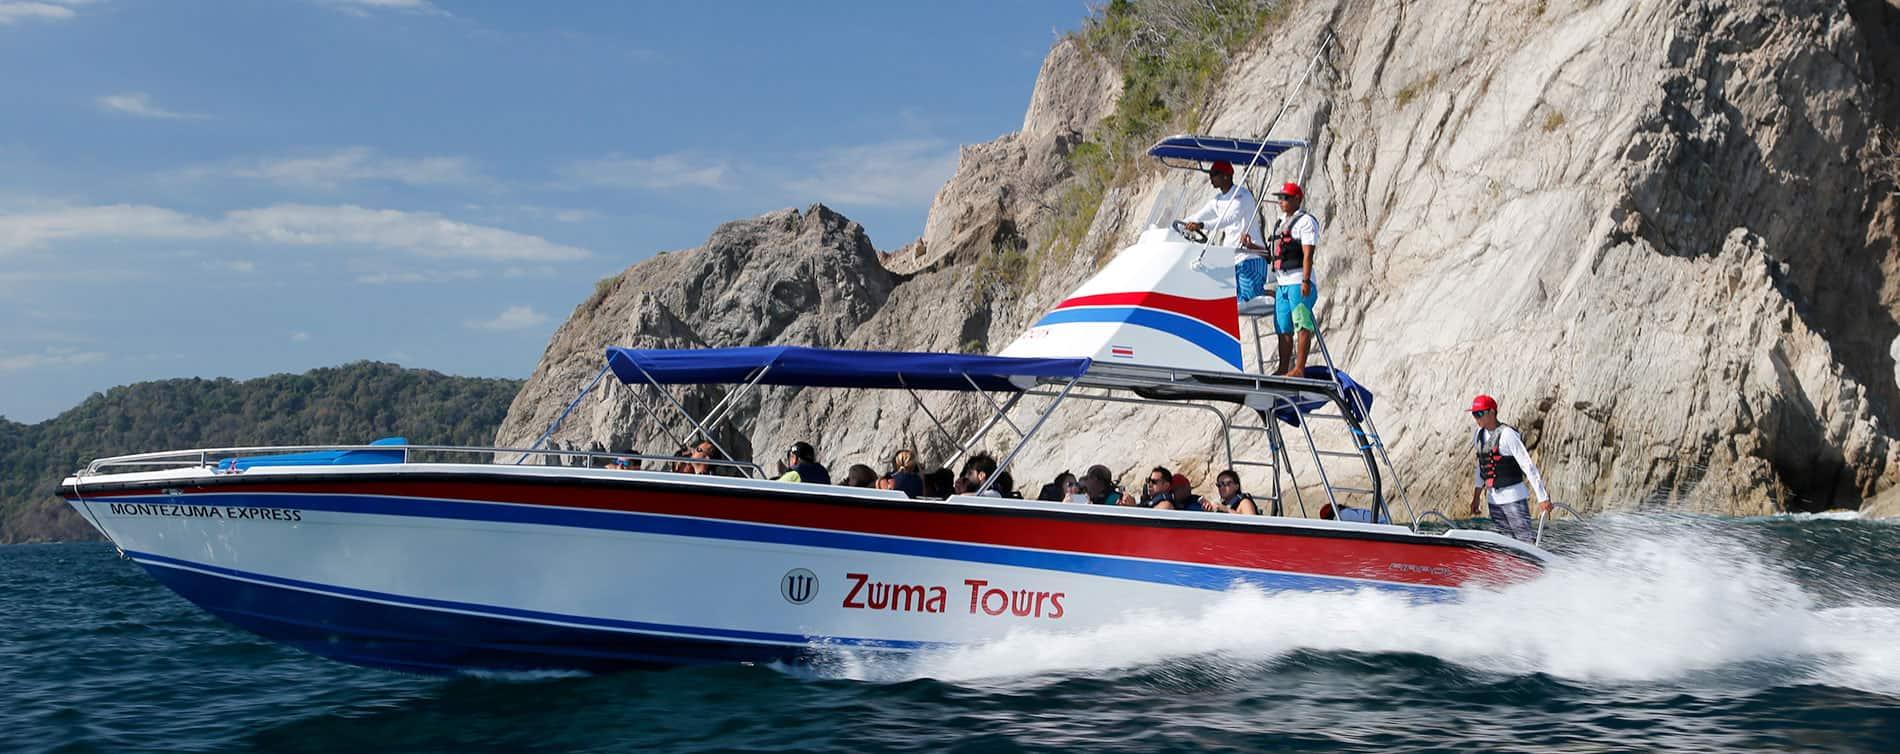 Montezuma Jaco Water Taxi - Zuma Tours